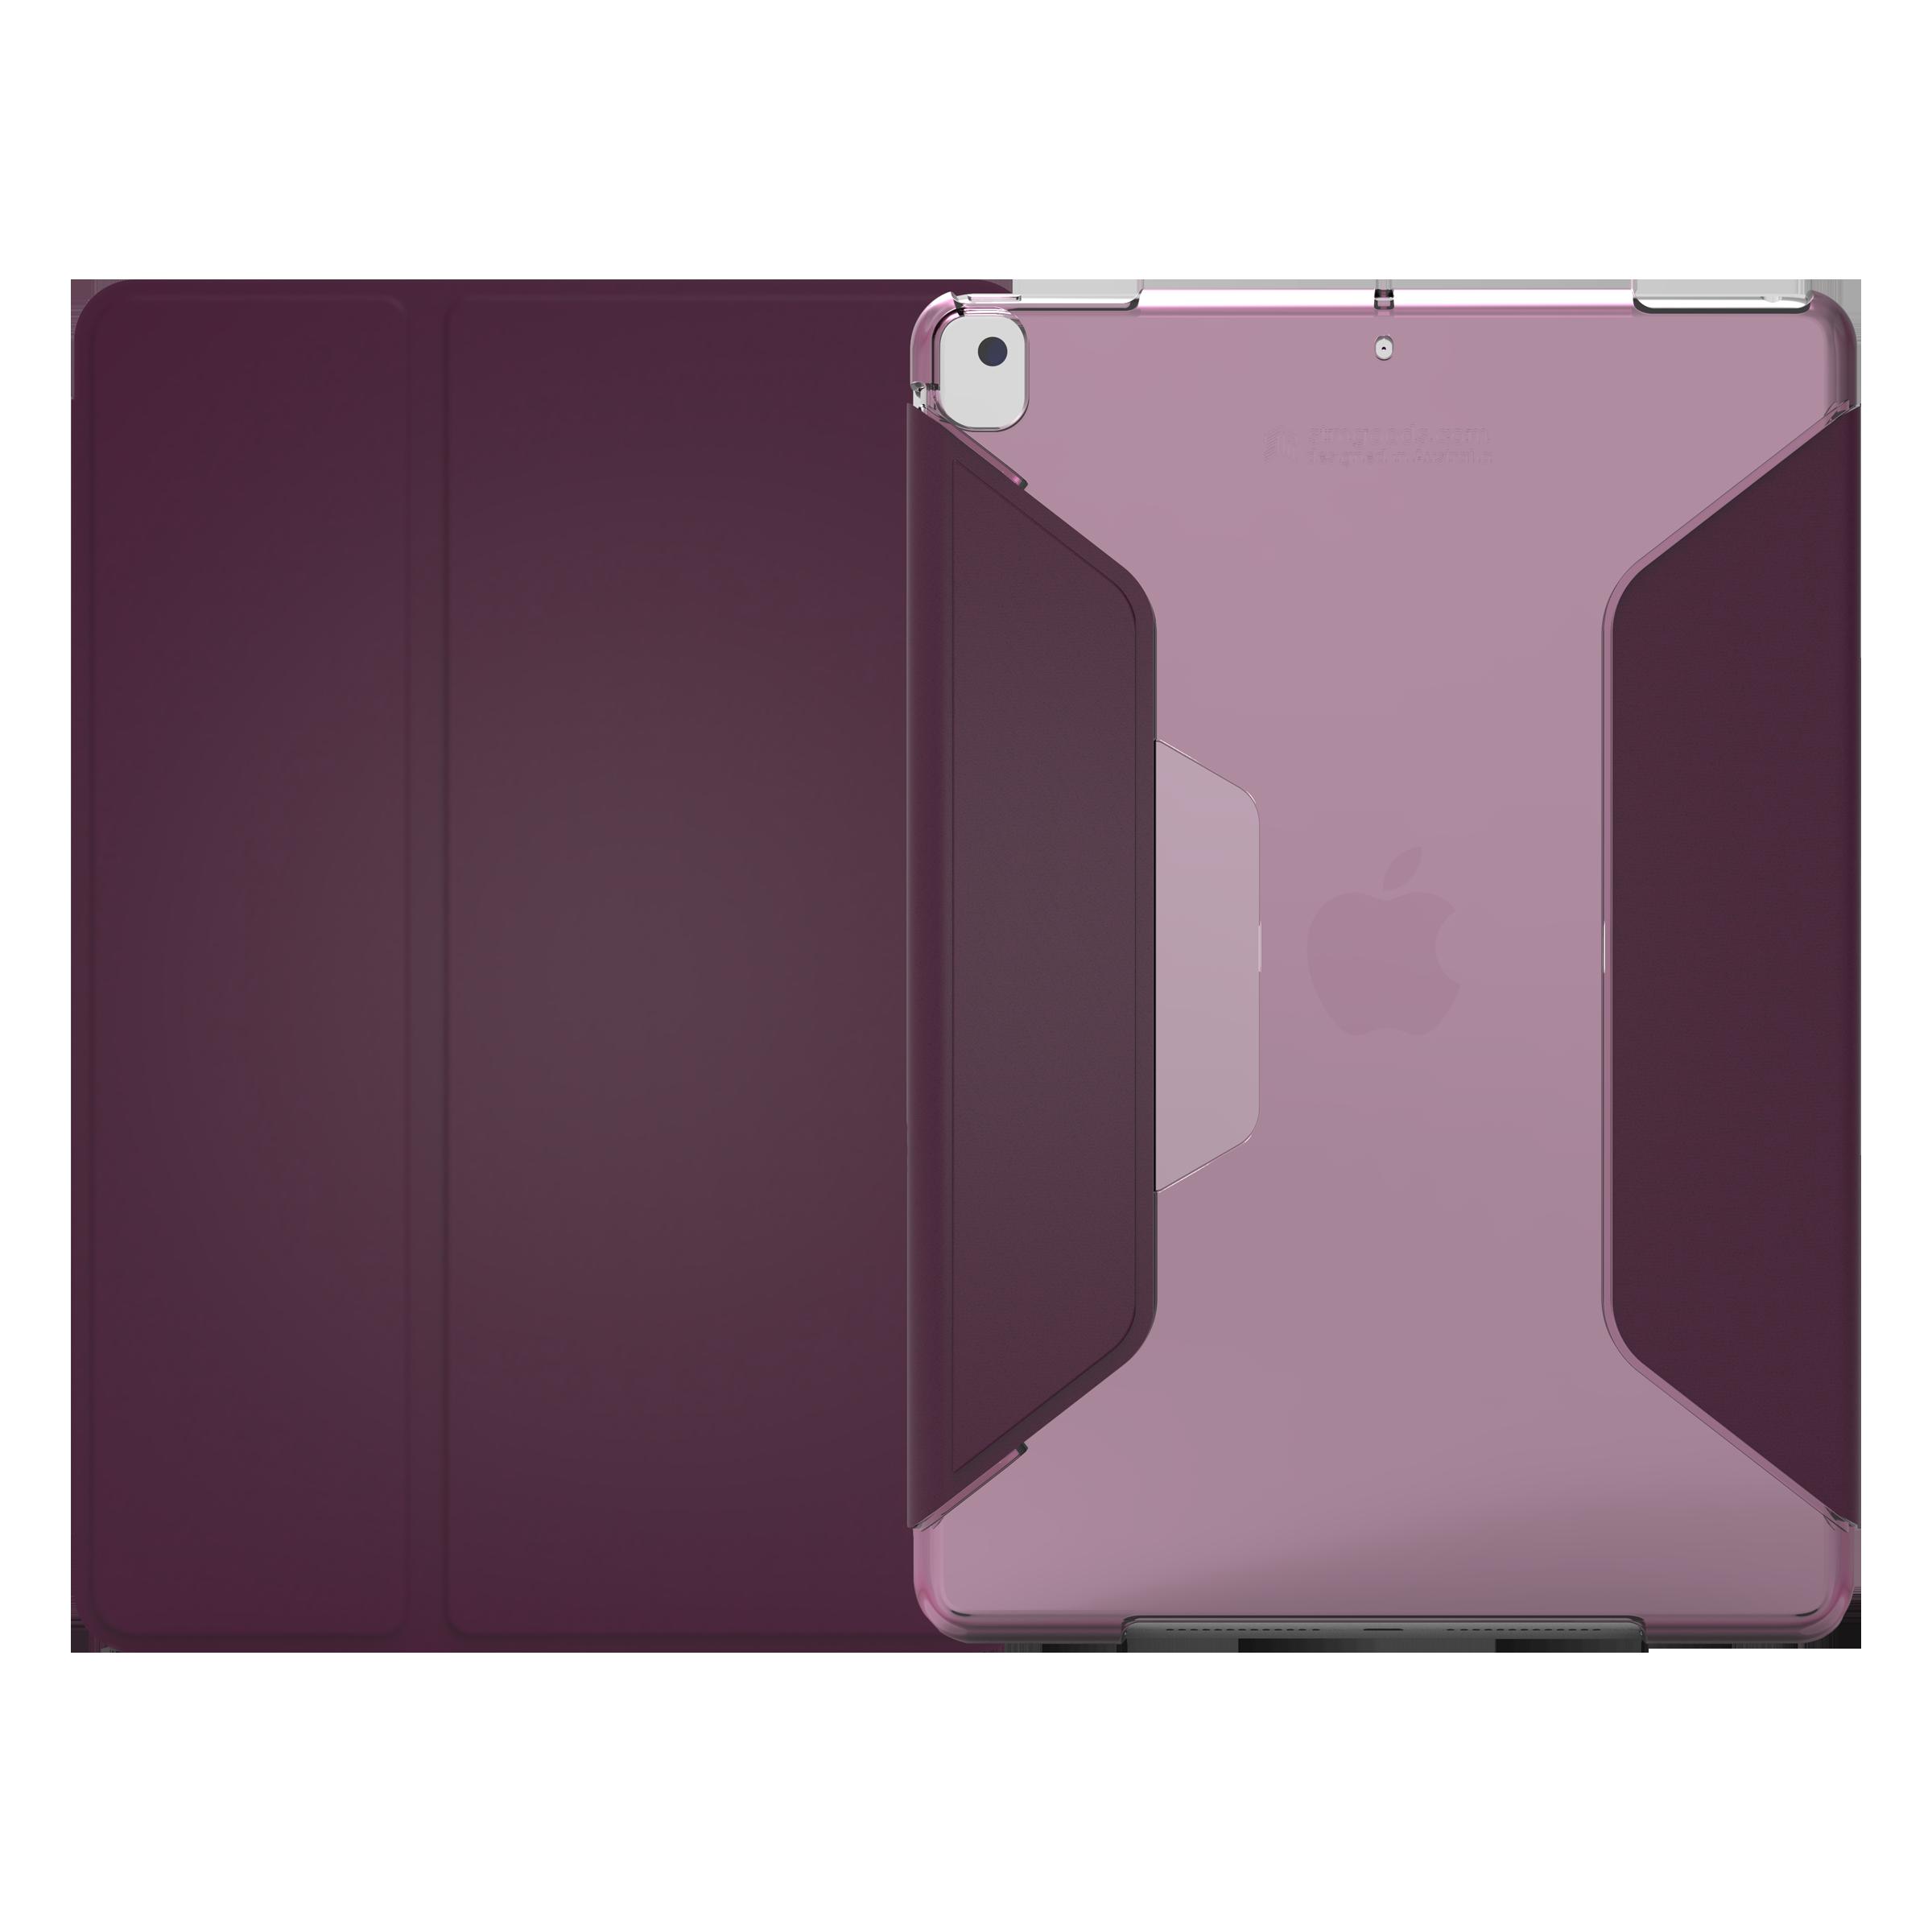 STM Studio Polycarbonate Flip Case For iPad 10.2 Inch 7th Gen (Instant On/Off Cover, STM-222-161JU-02, Dark Purple Smoke)_1